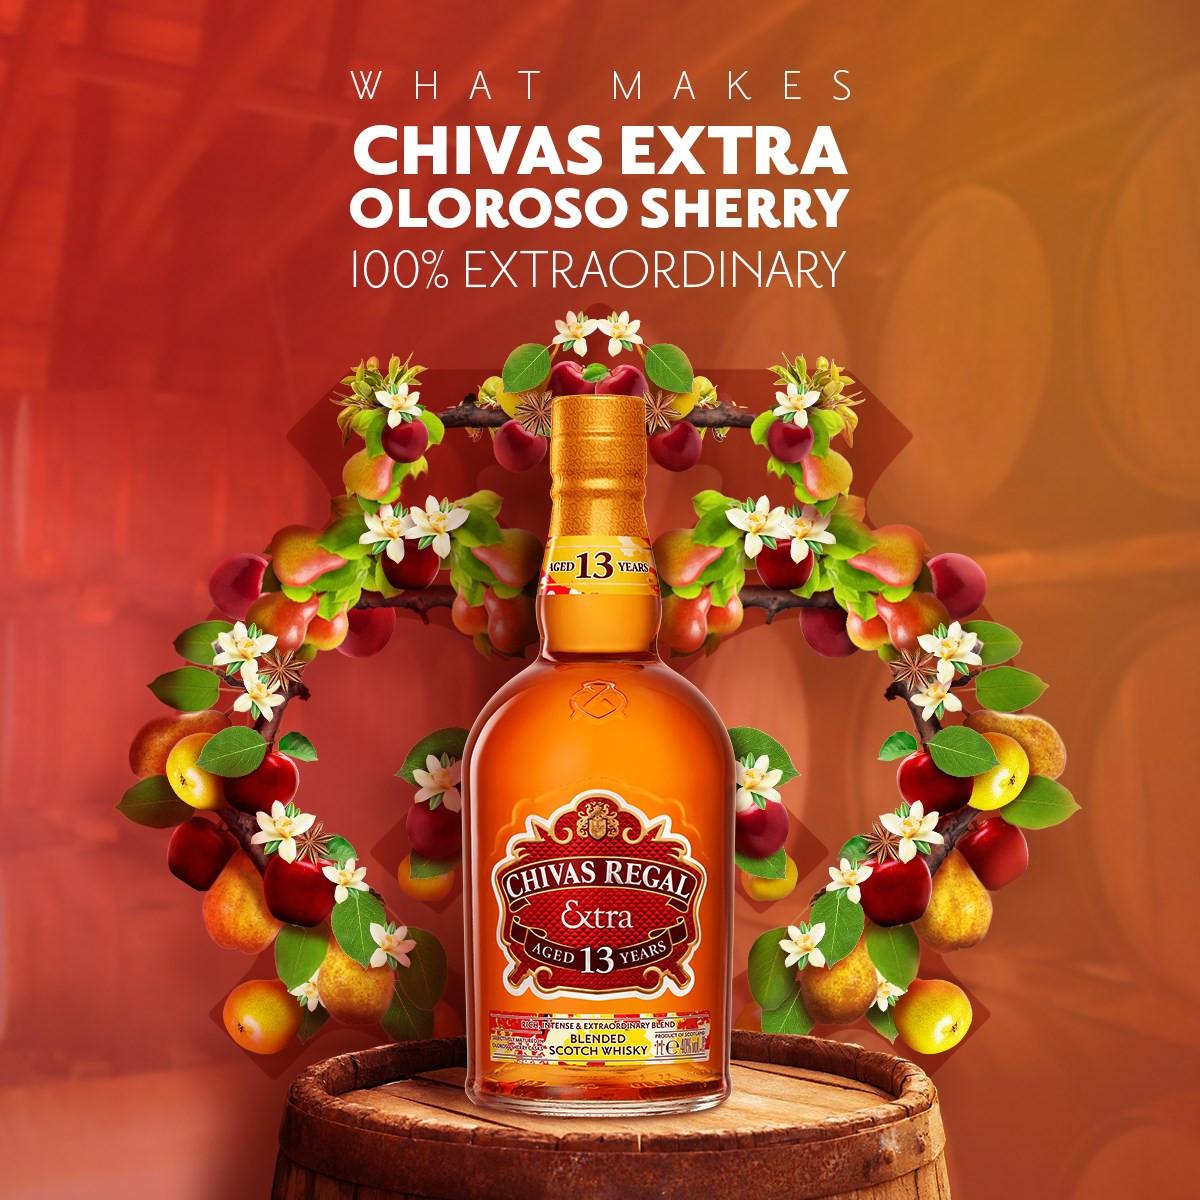 CHIVAS EXTRA 13 KING STREET OLOROSO SHERRY CASK